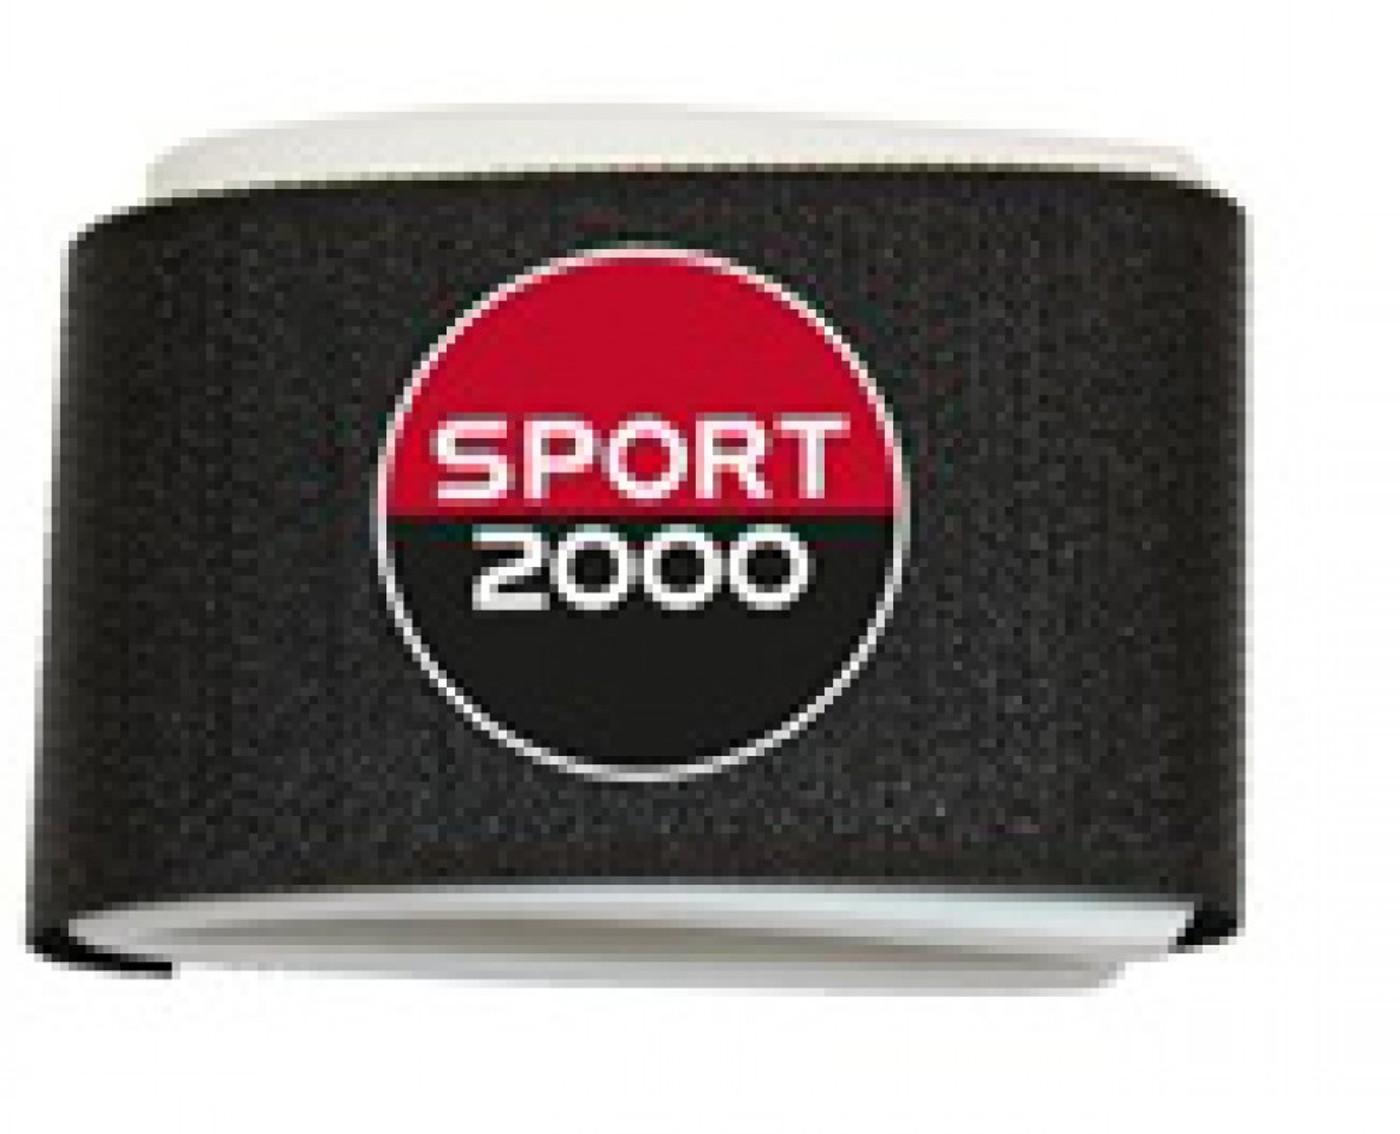 SPORT 2000 TW LL 38 mm